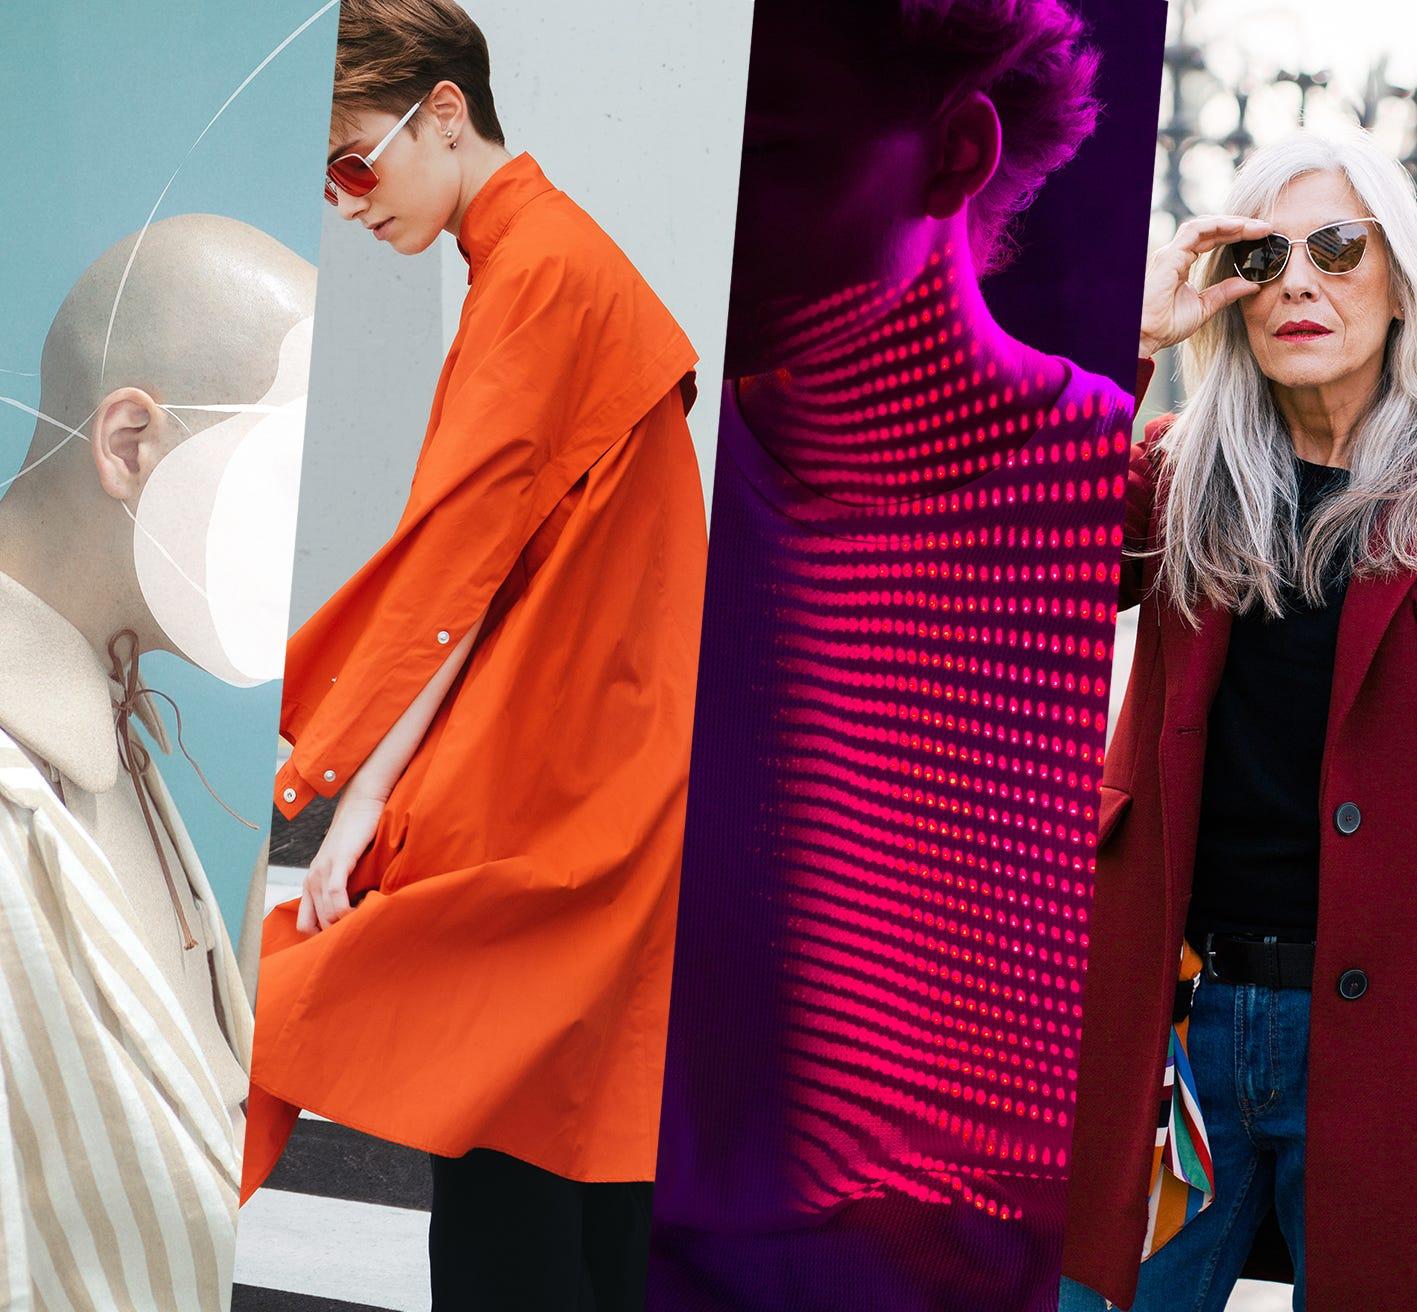 Fashion Color Trend Report New York Fashion Week Autumn Winter 2019 2020 Pantone